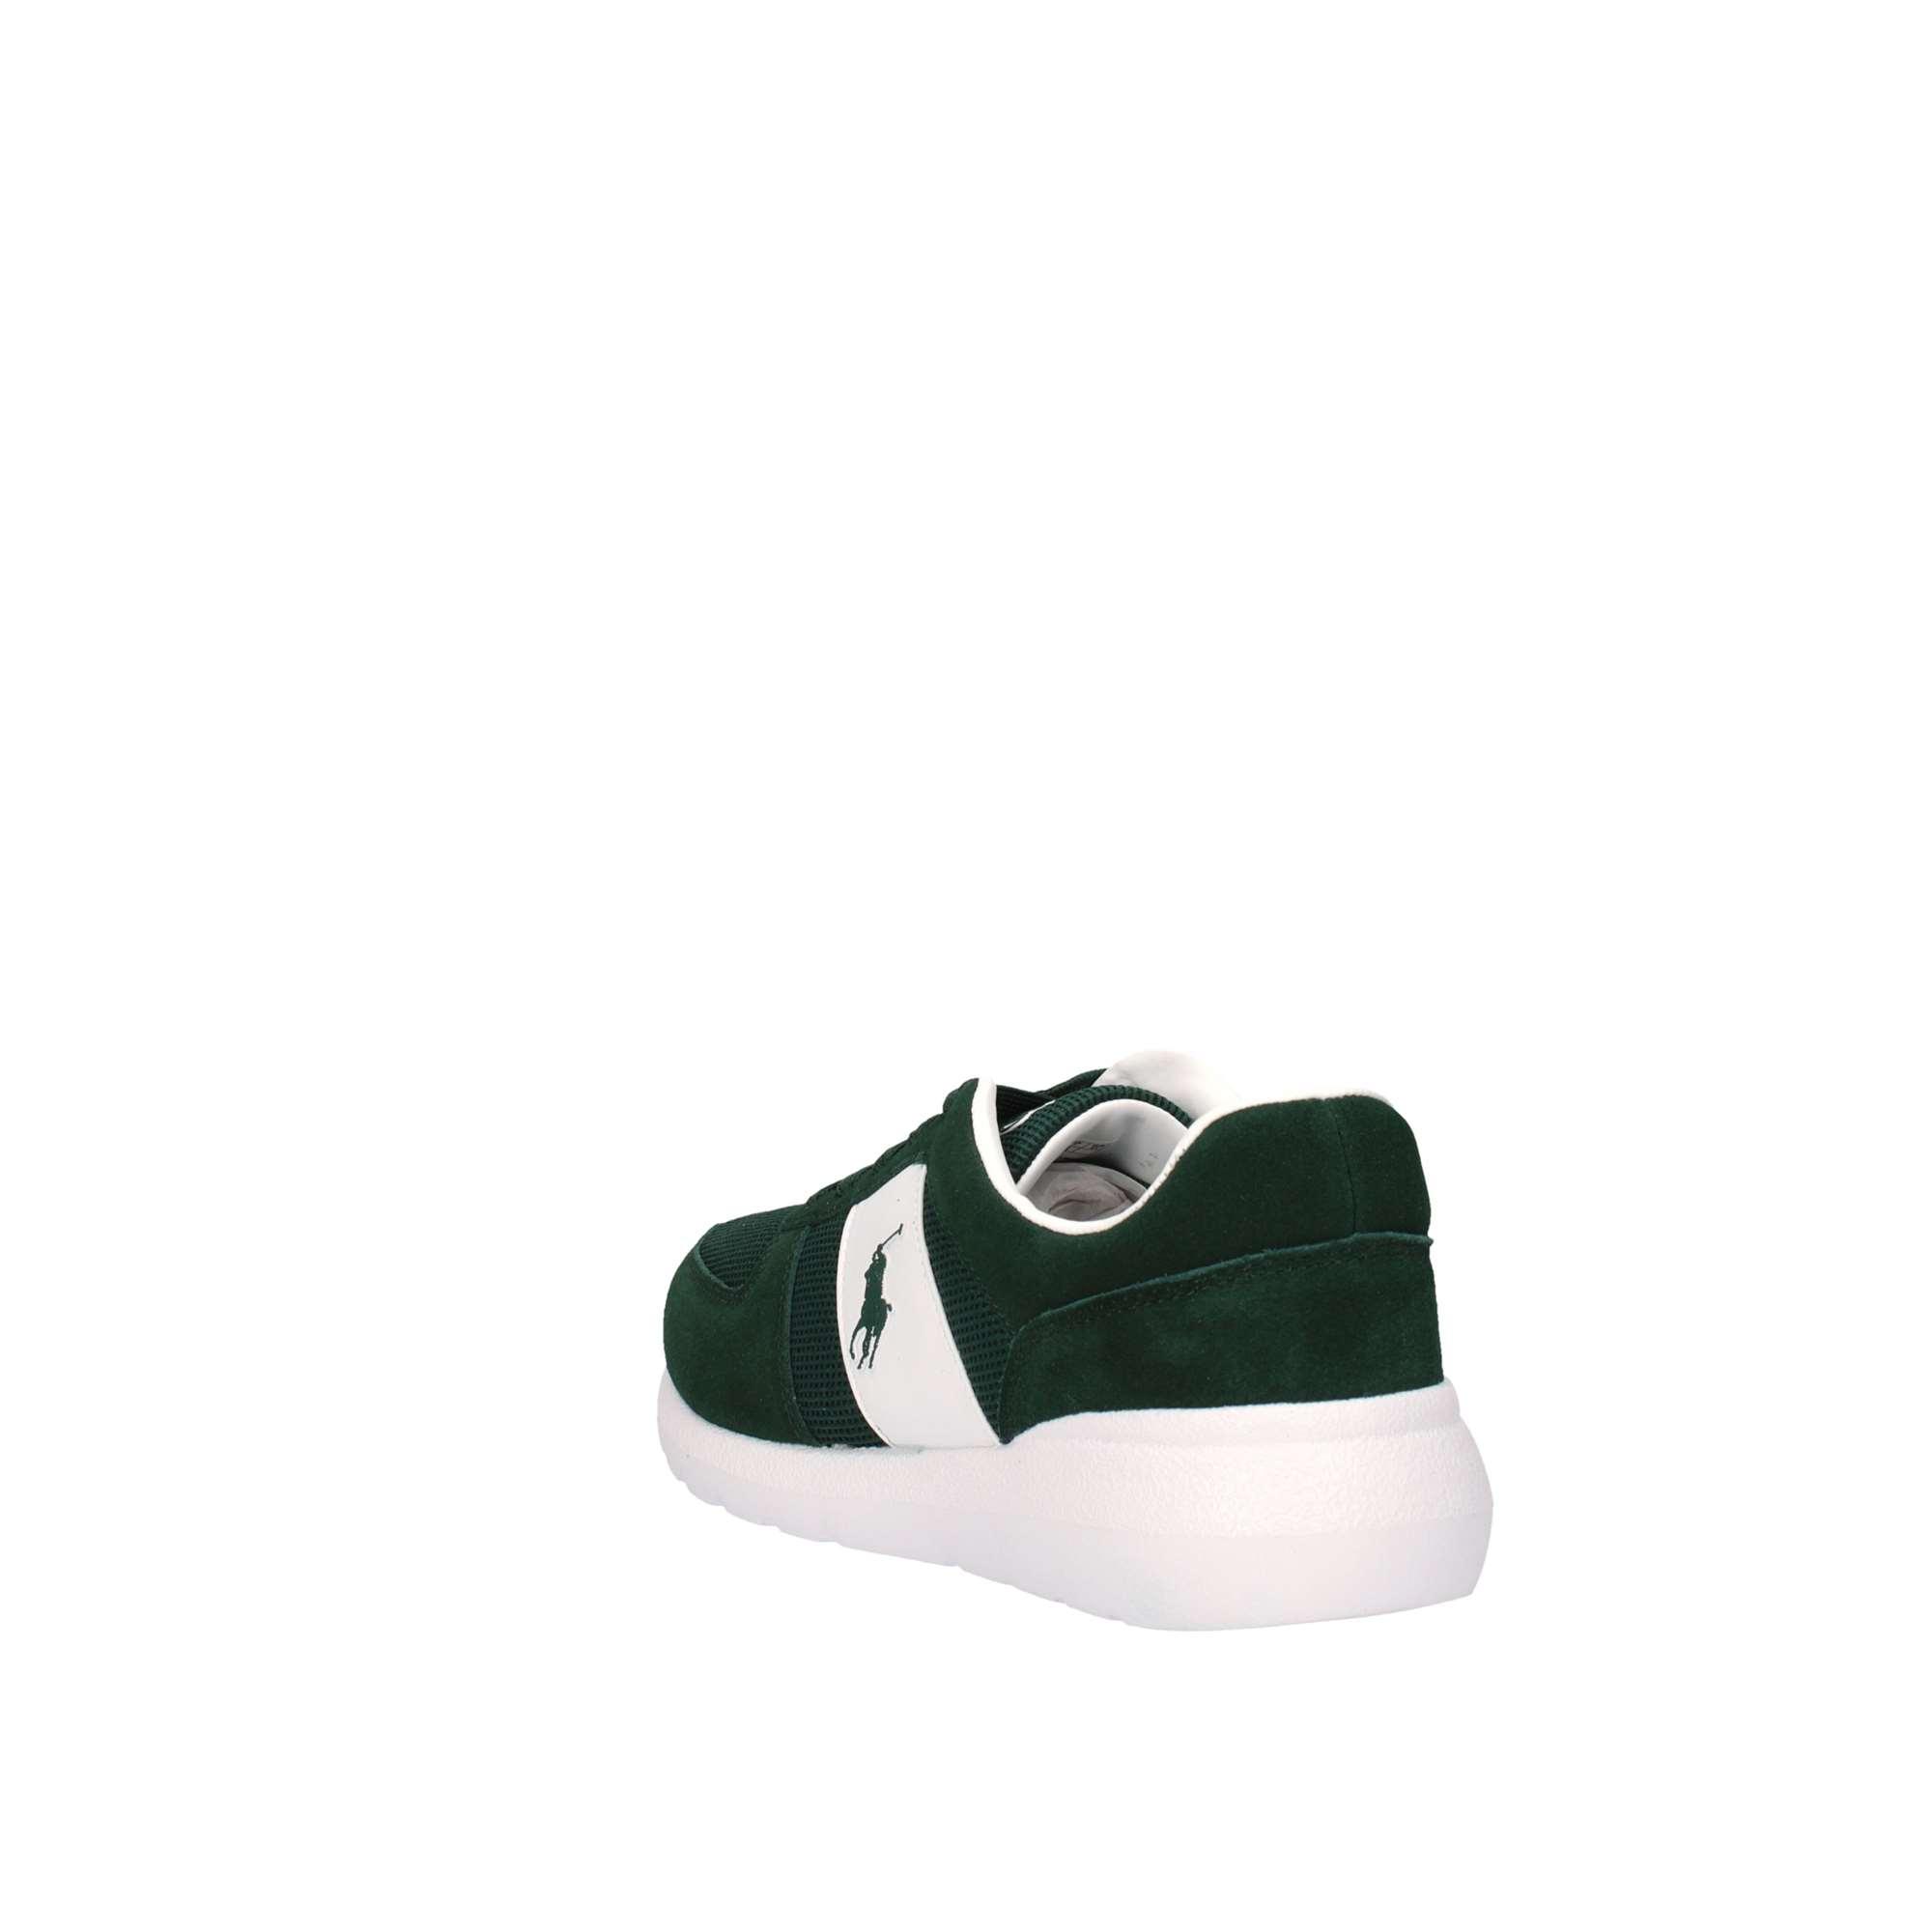 Sneakers-Uomo-Polo-Ralph-Lauren-XZ4Z2-XY4Z2-XW4TN-Primavera-Estate